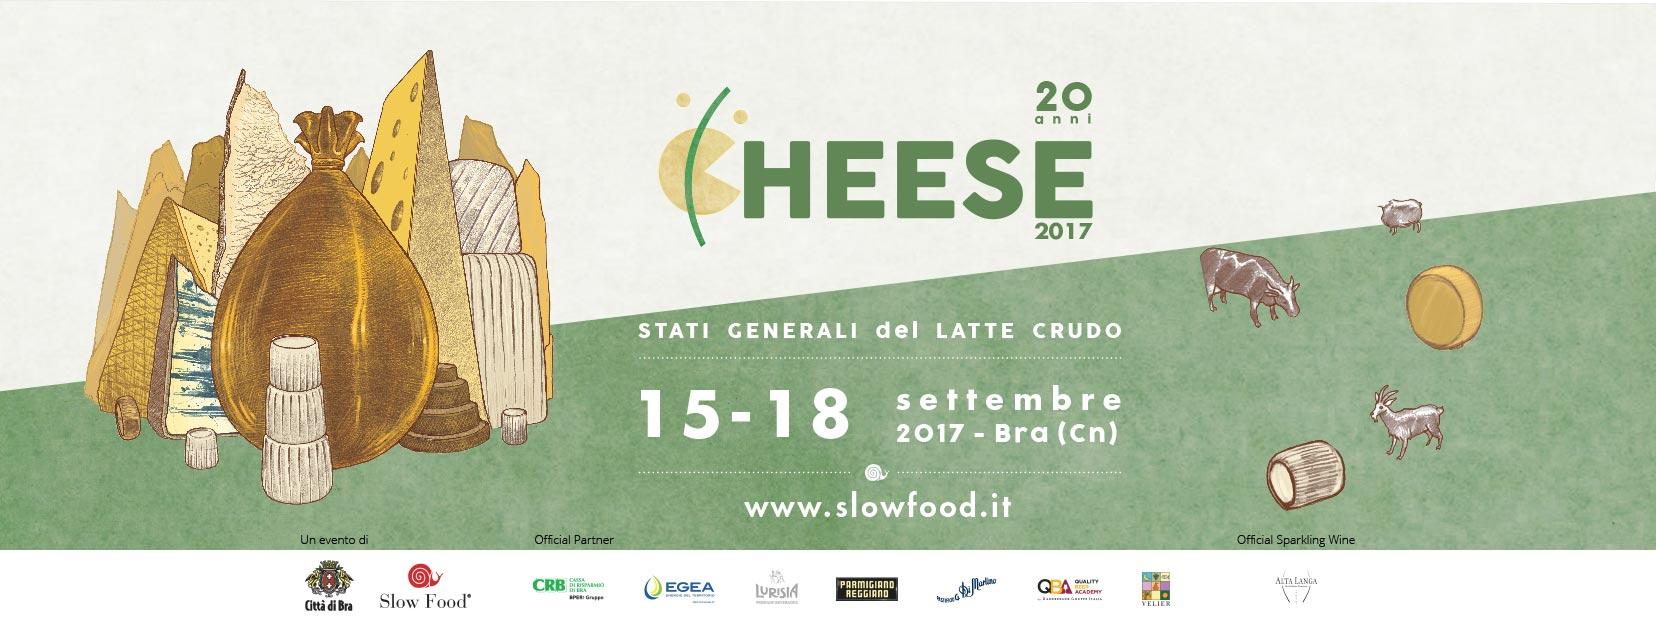 Stati Generali del Latte Cheese 2017